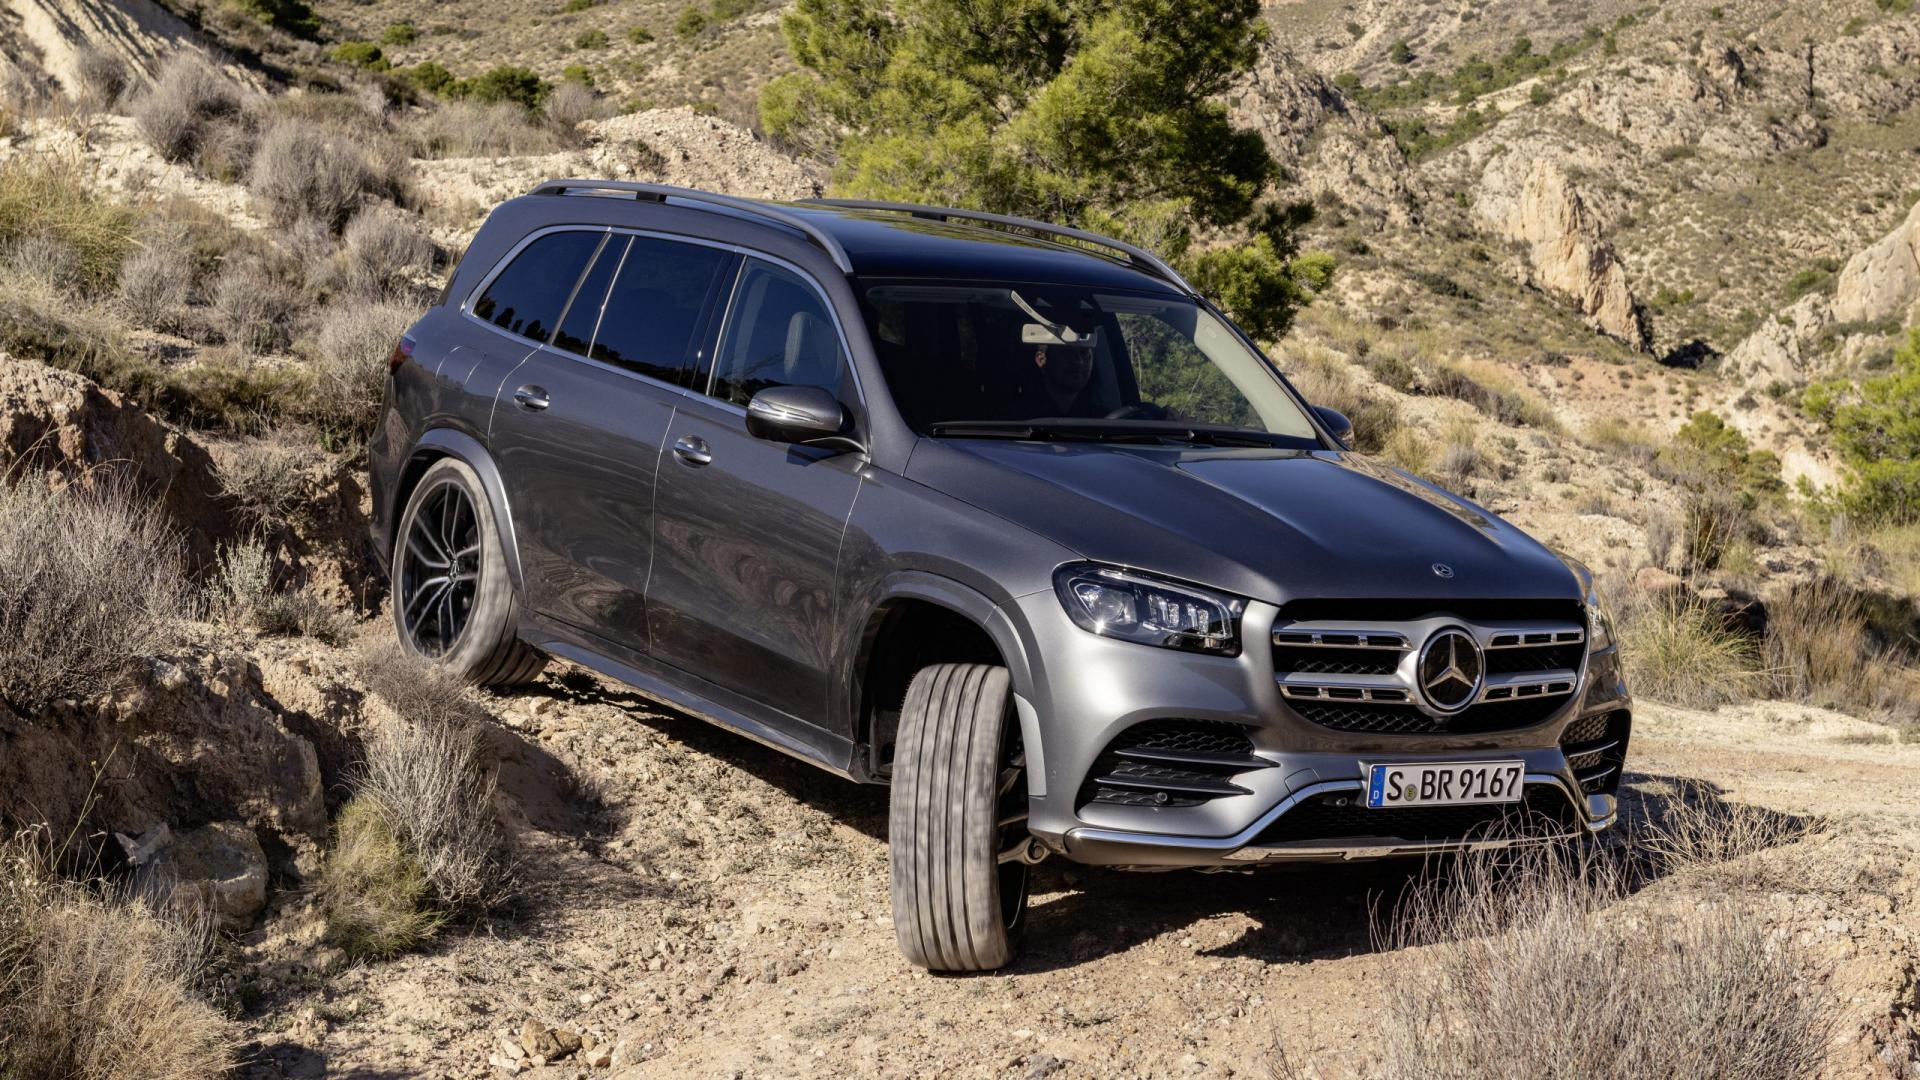 Mercedes-Benz GLS, 2019 AMG Line Selenite Grey offroad